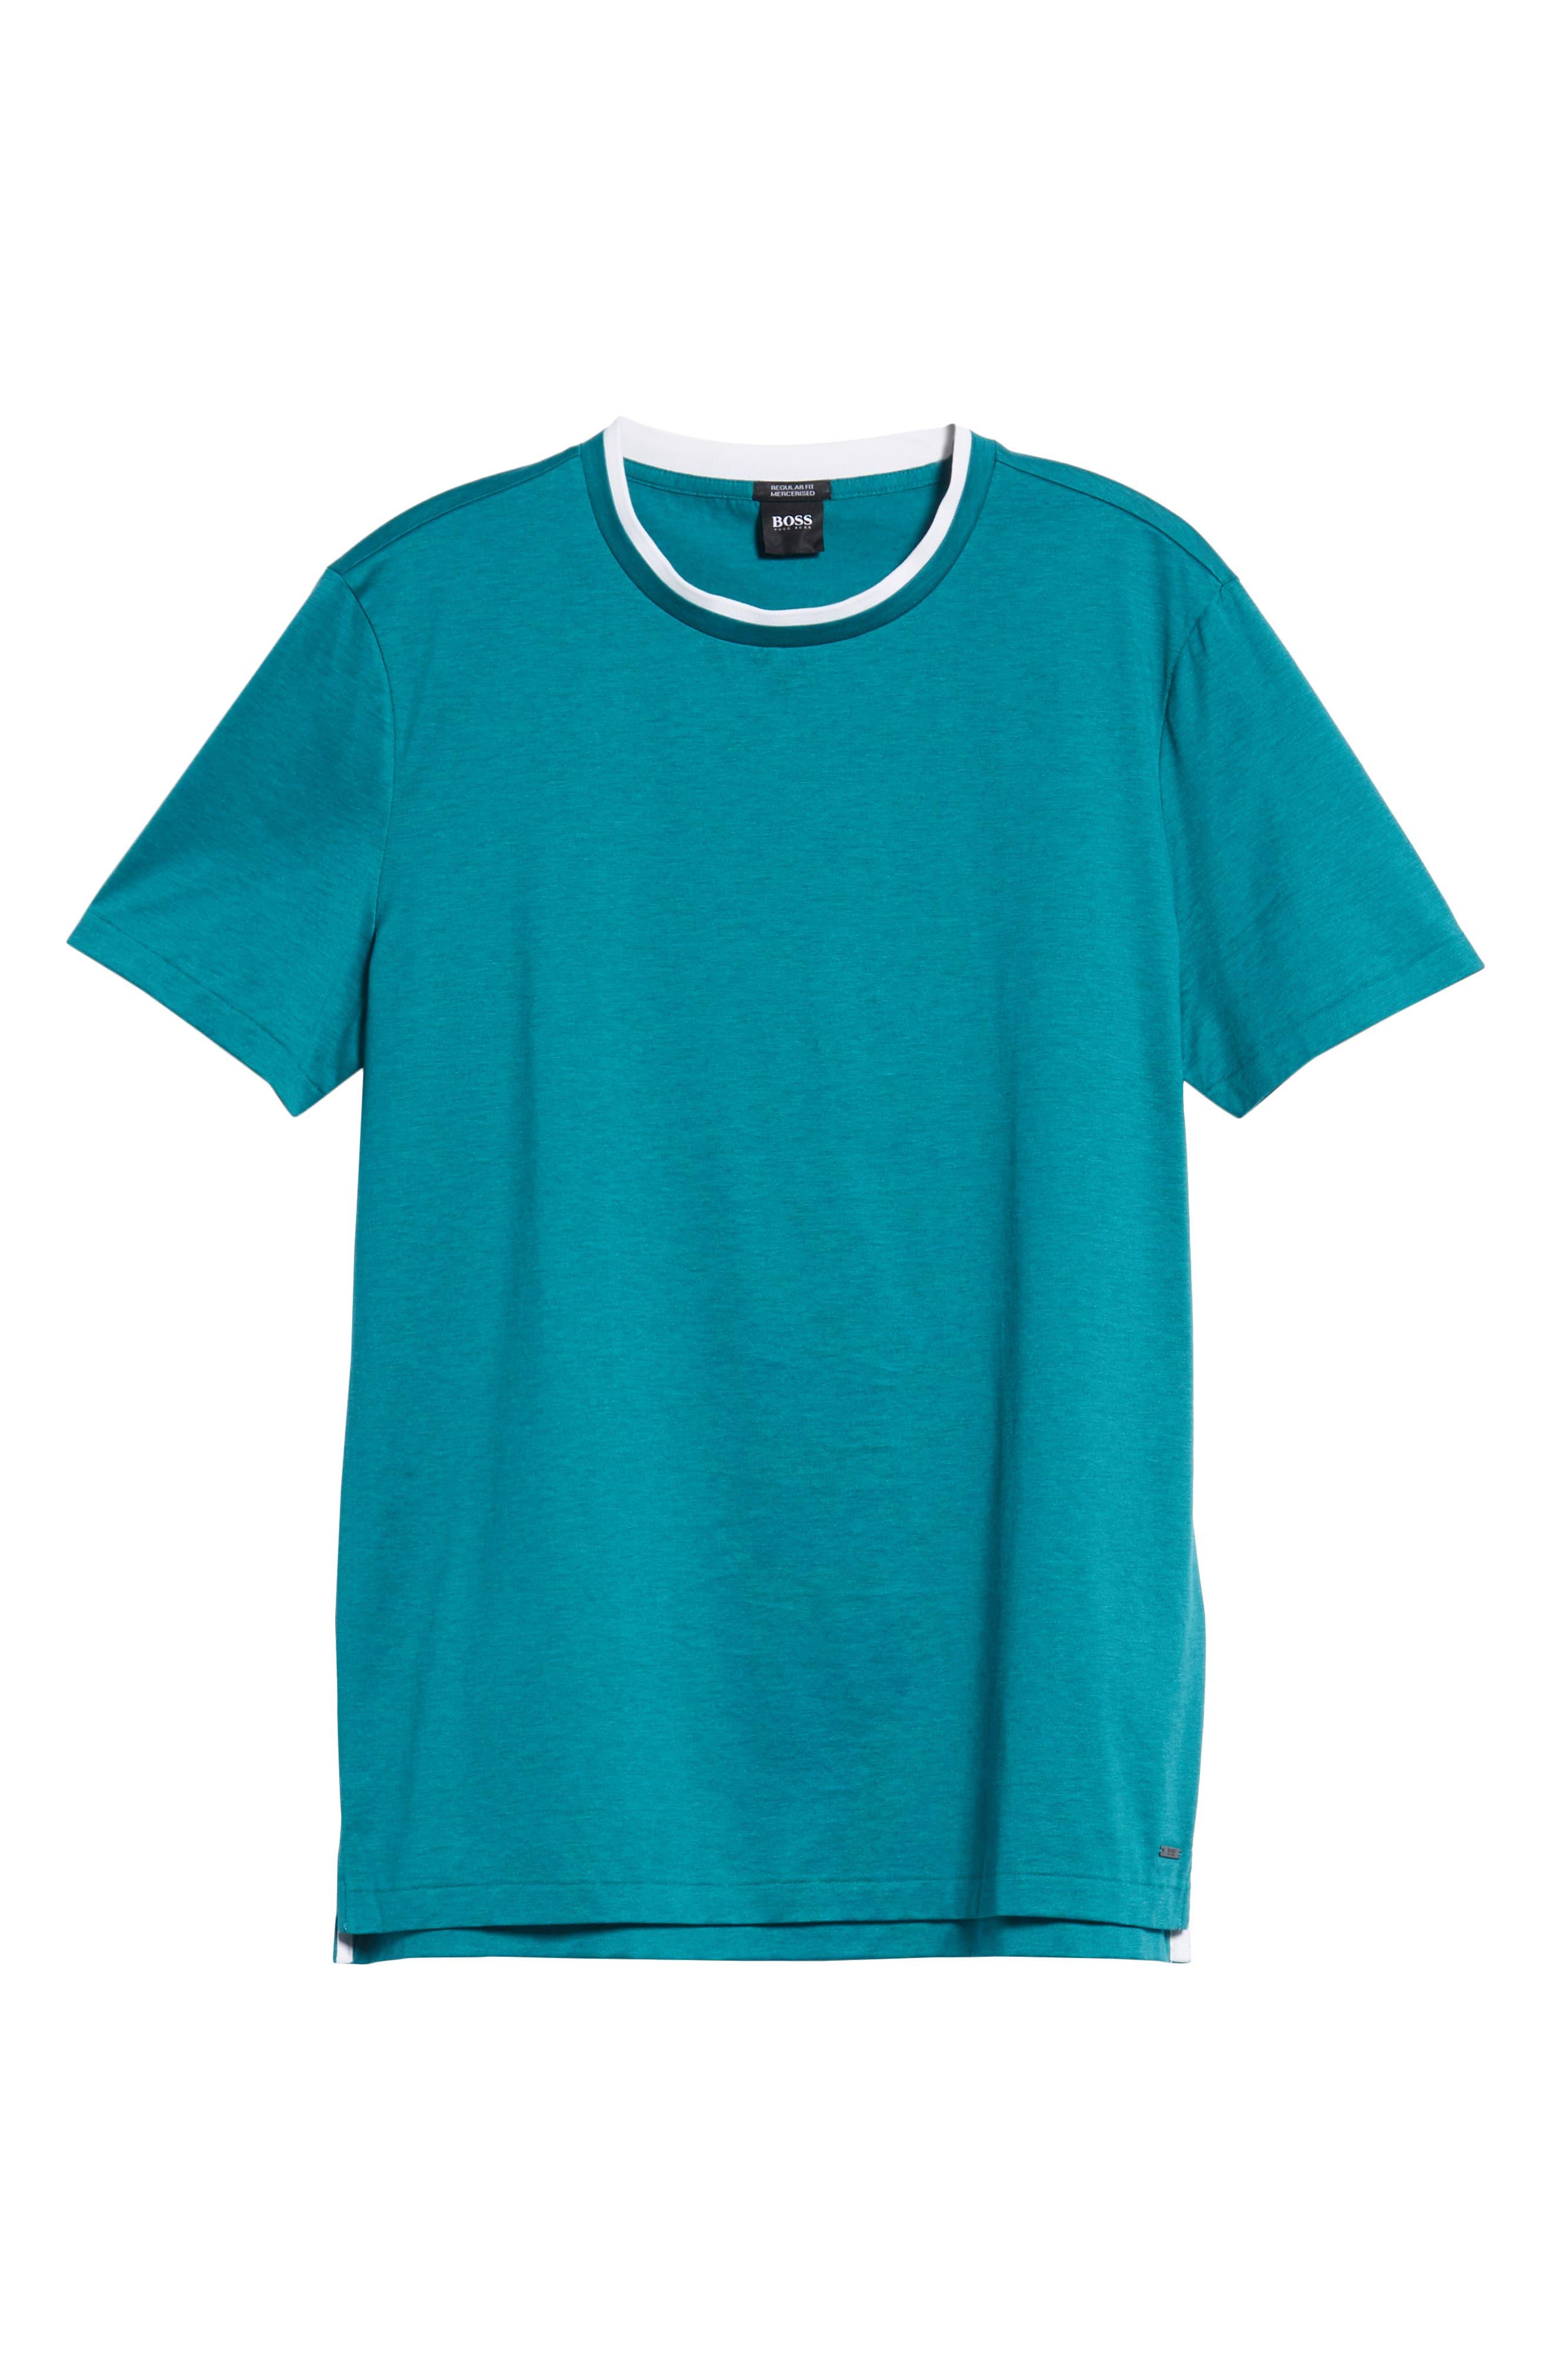 Taber Regular Fit T-Shirt,                             Alternate thumbnail 6, color,                             312